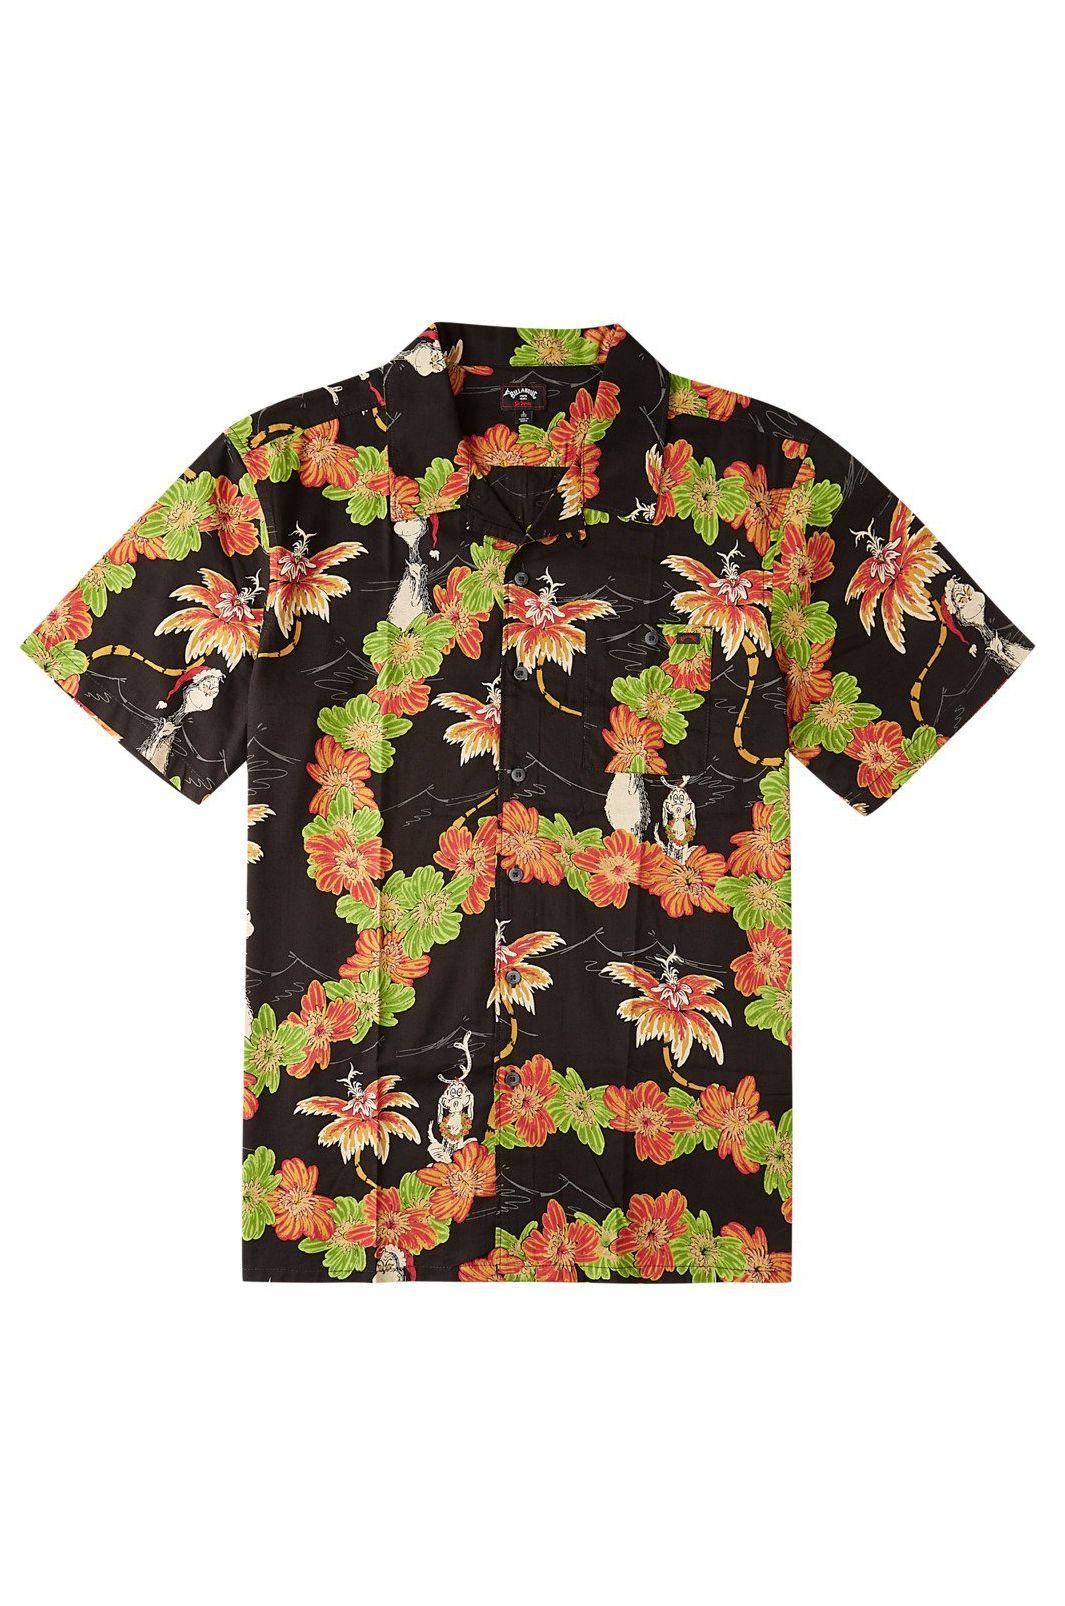 Billabong Shirt SUNDAYS VACAY GRINCH DR SEUSS Black